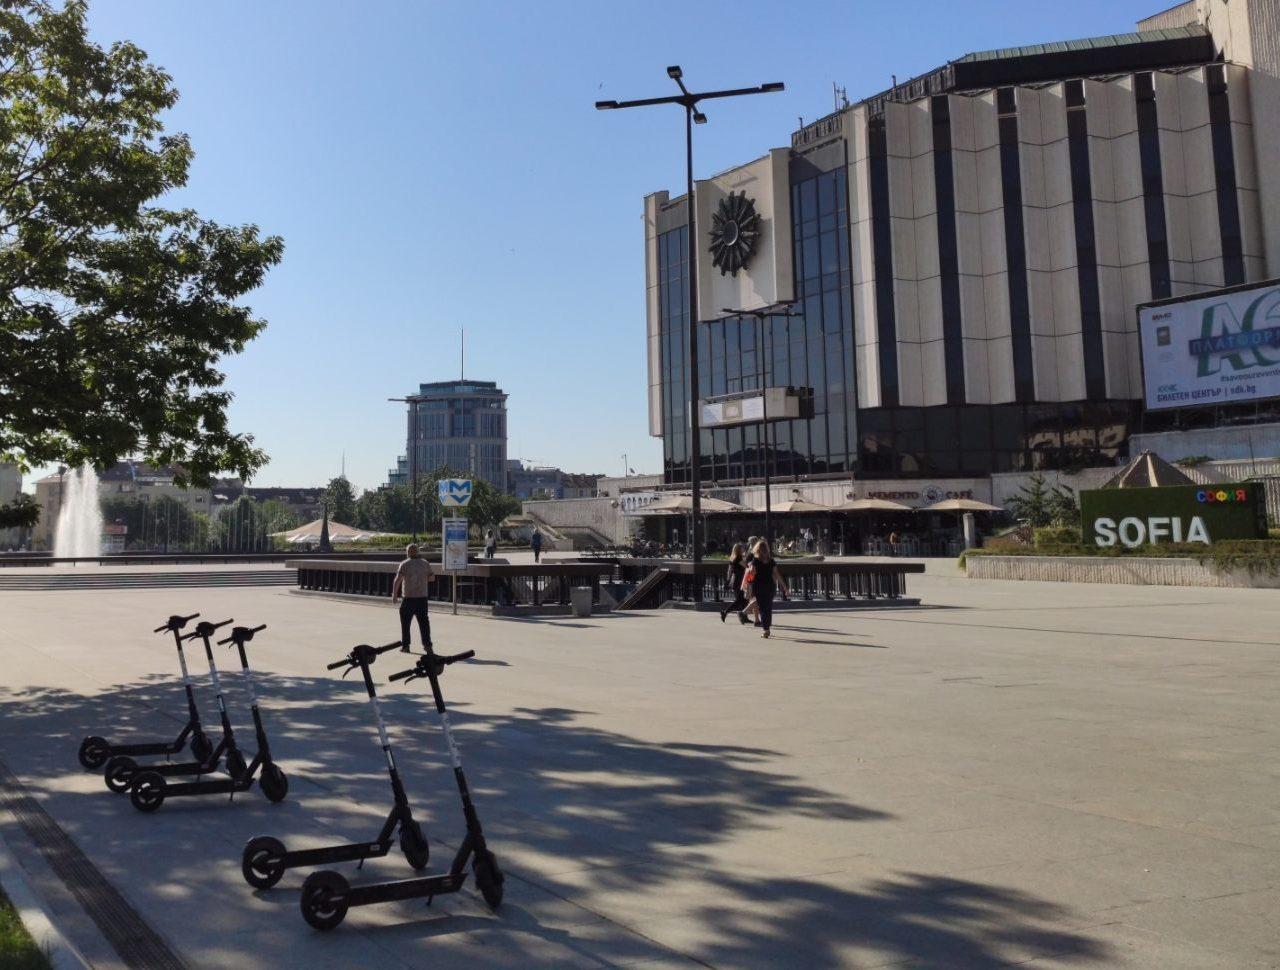 Sofia-City-News-August-2020